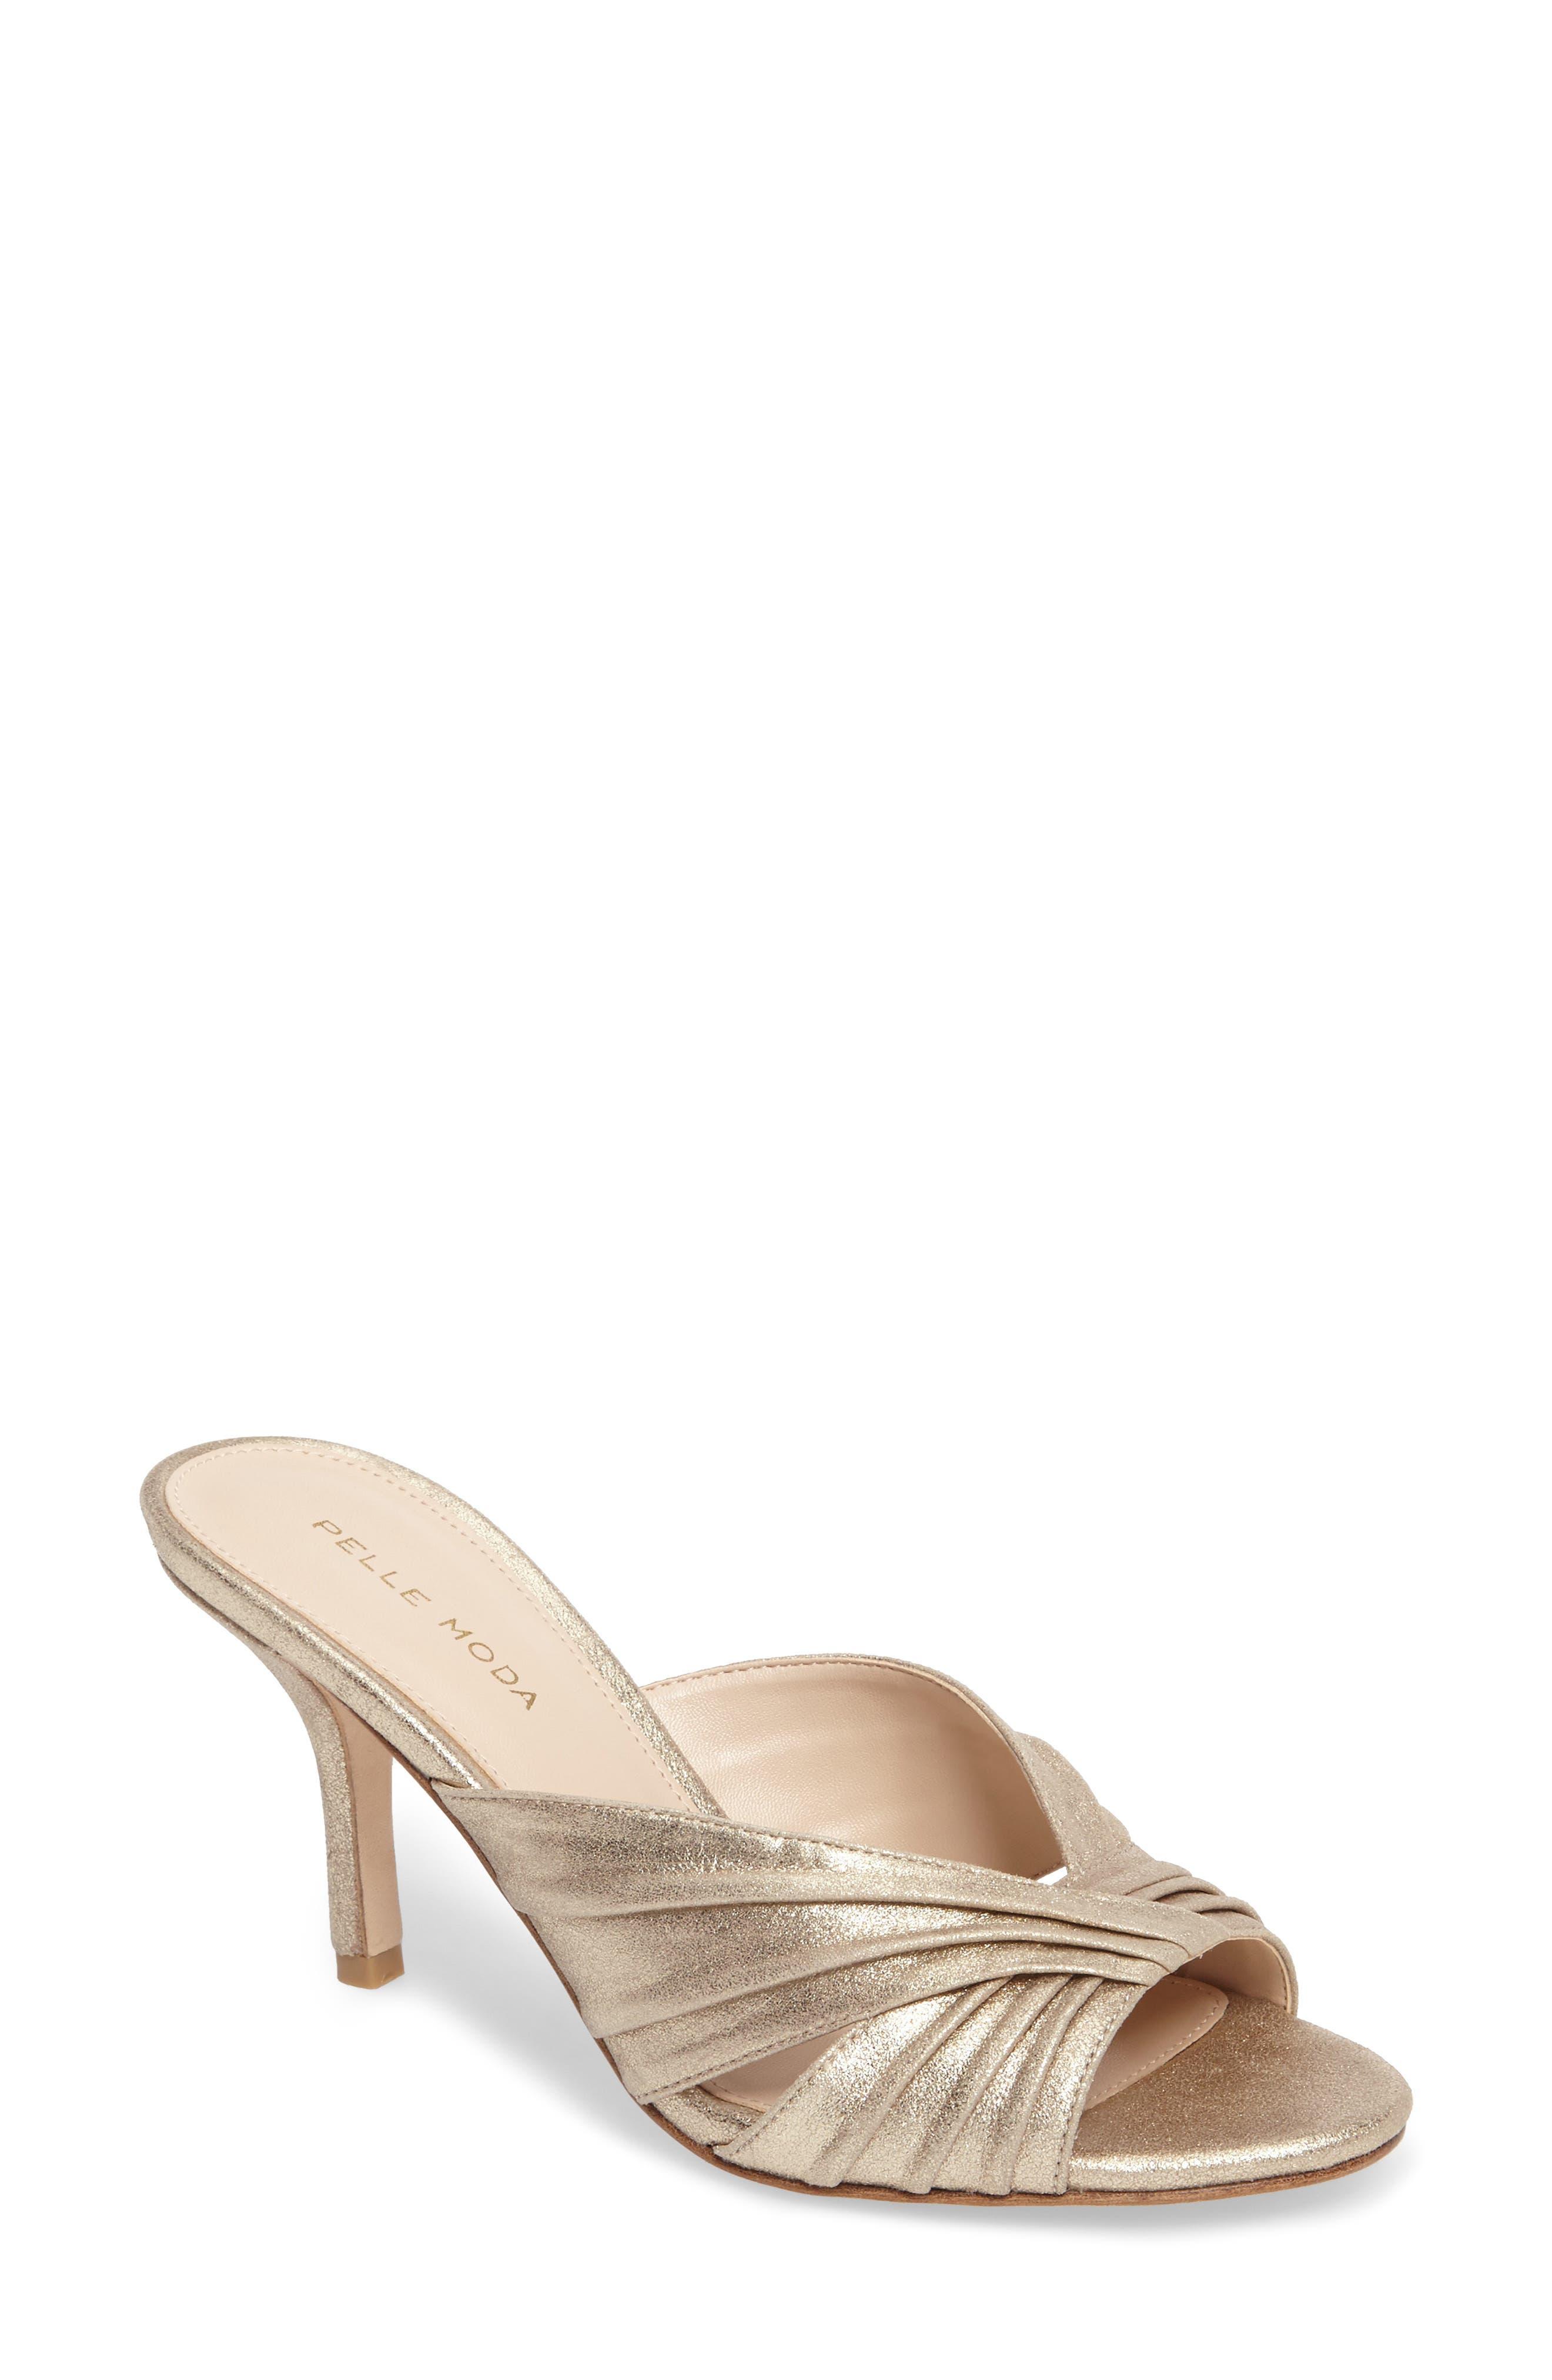 Isla Sandal,                         Main,                         color, Platinum Gold Leather